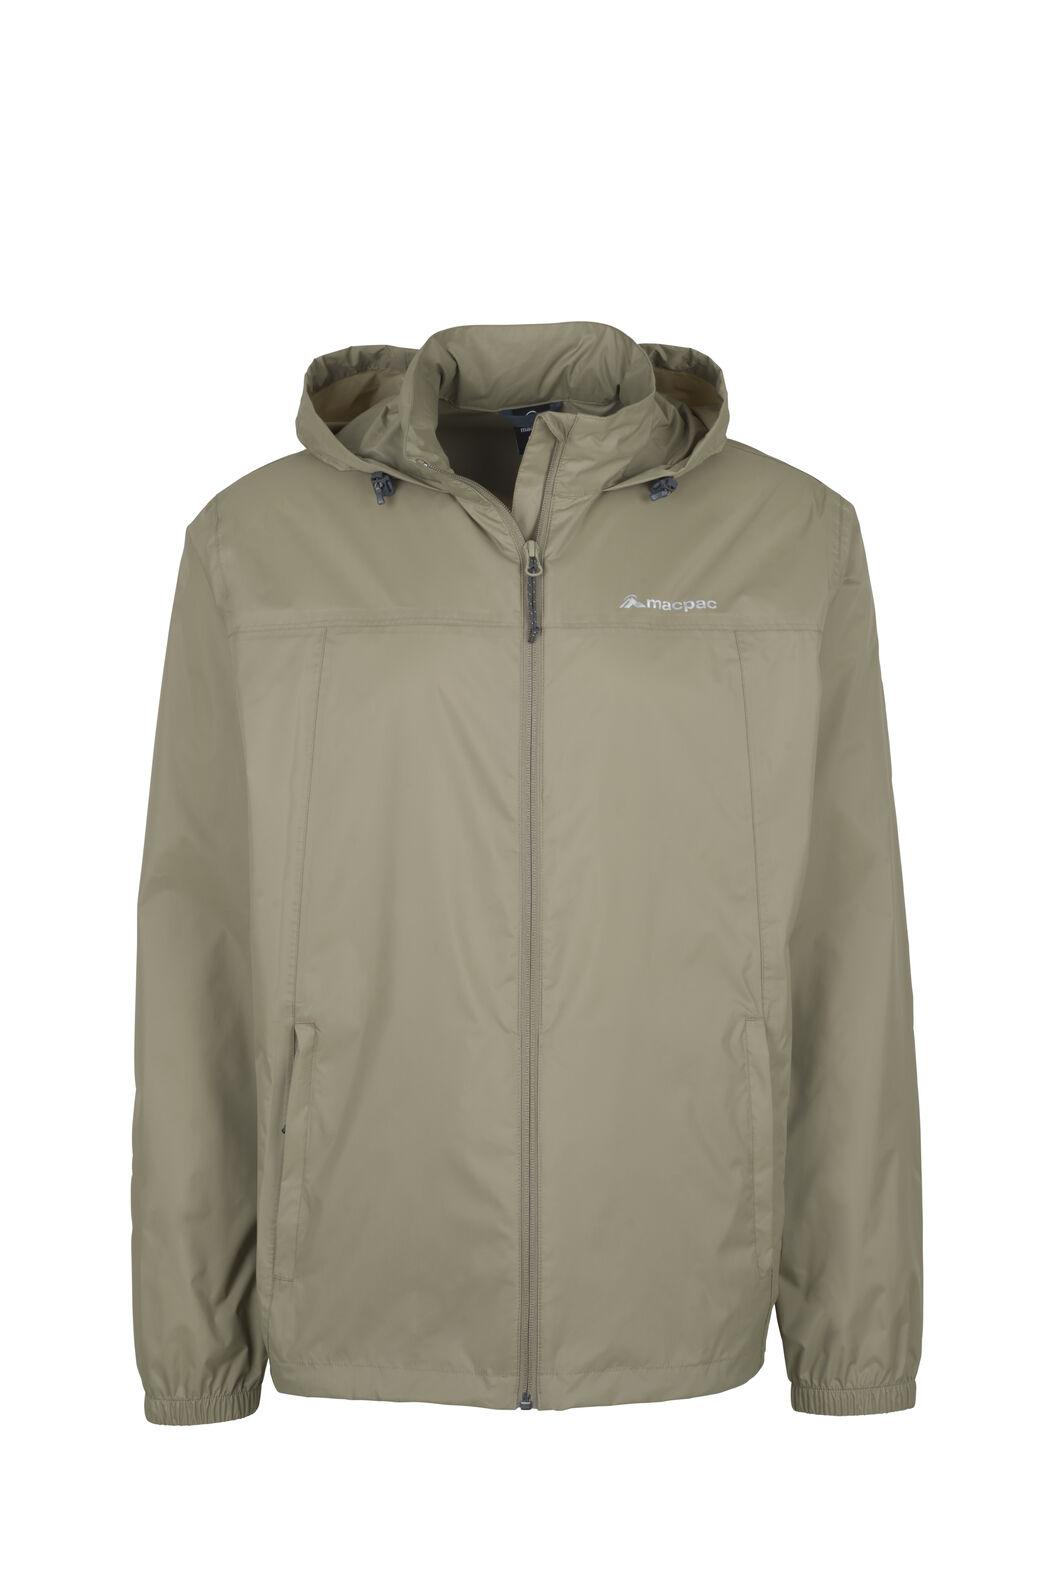 Macpac Pack-It-Jacket - Unisex, Covert Green, hi-res